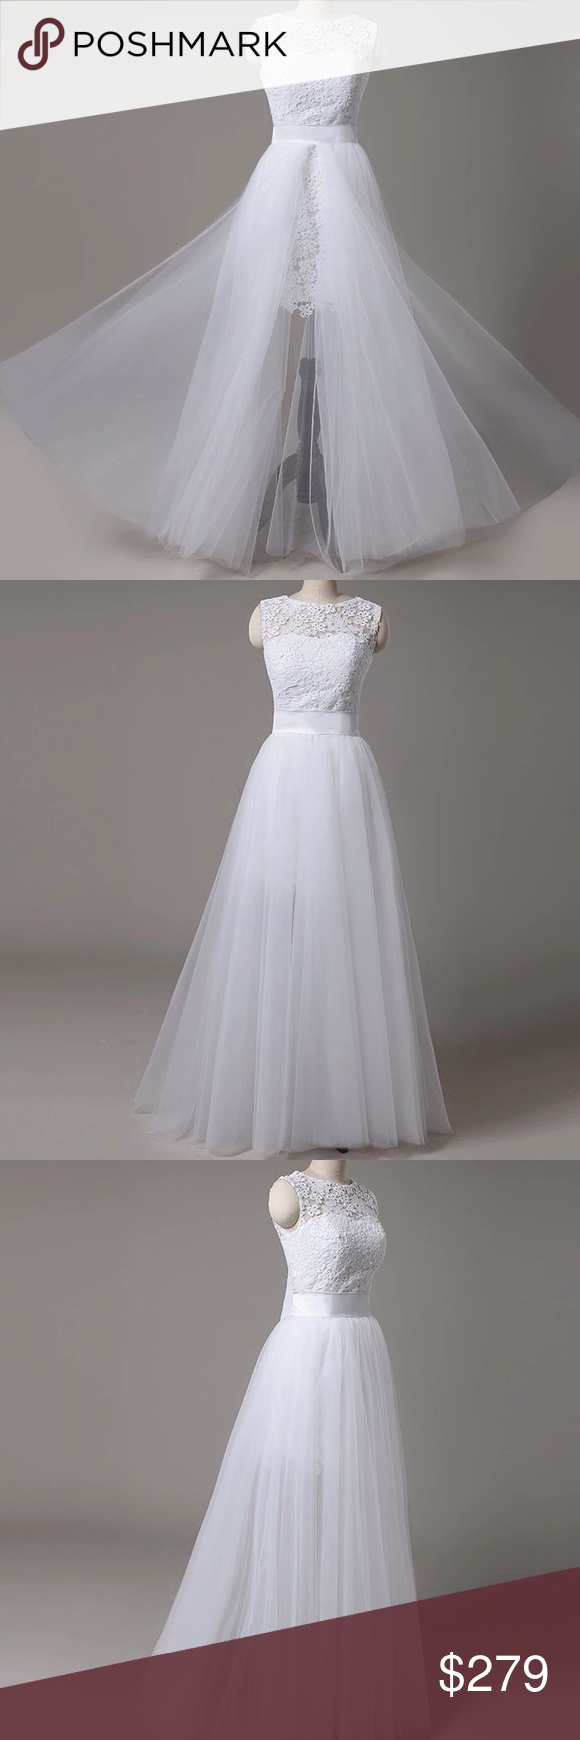 Short wedding dress boutique short wedding dresses white short